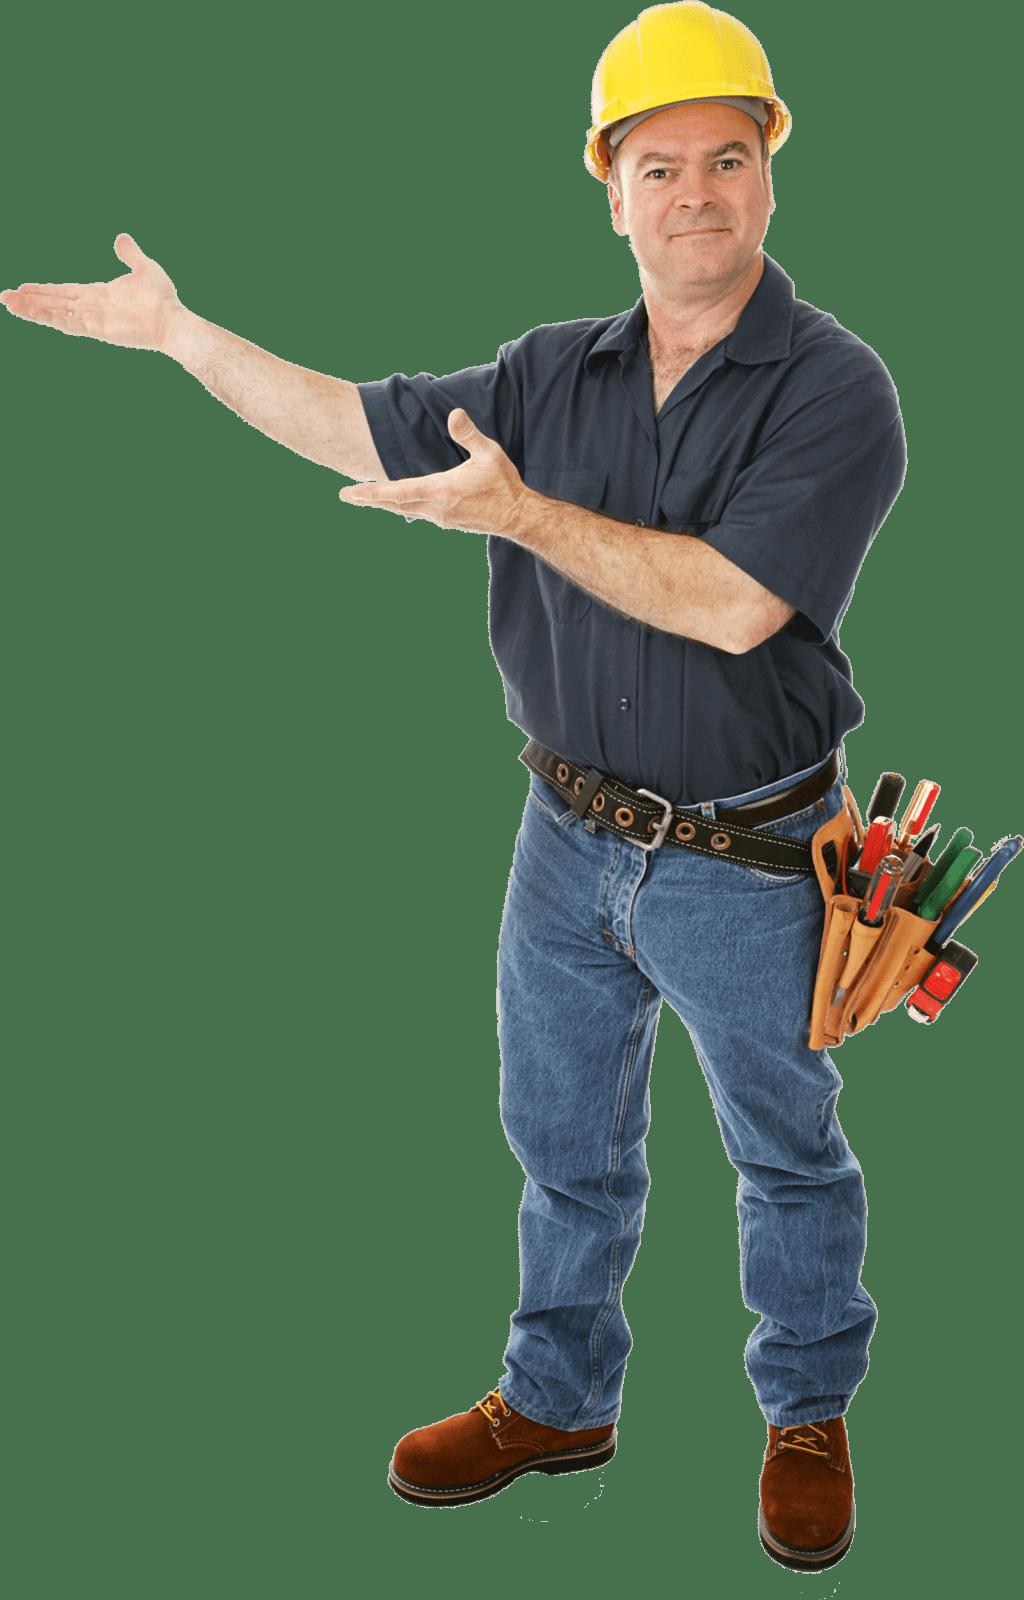 Atlanta Dump truck hauling and grading company worker